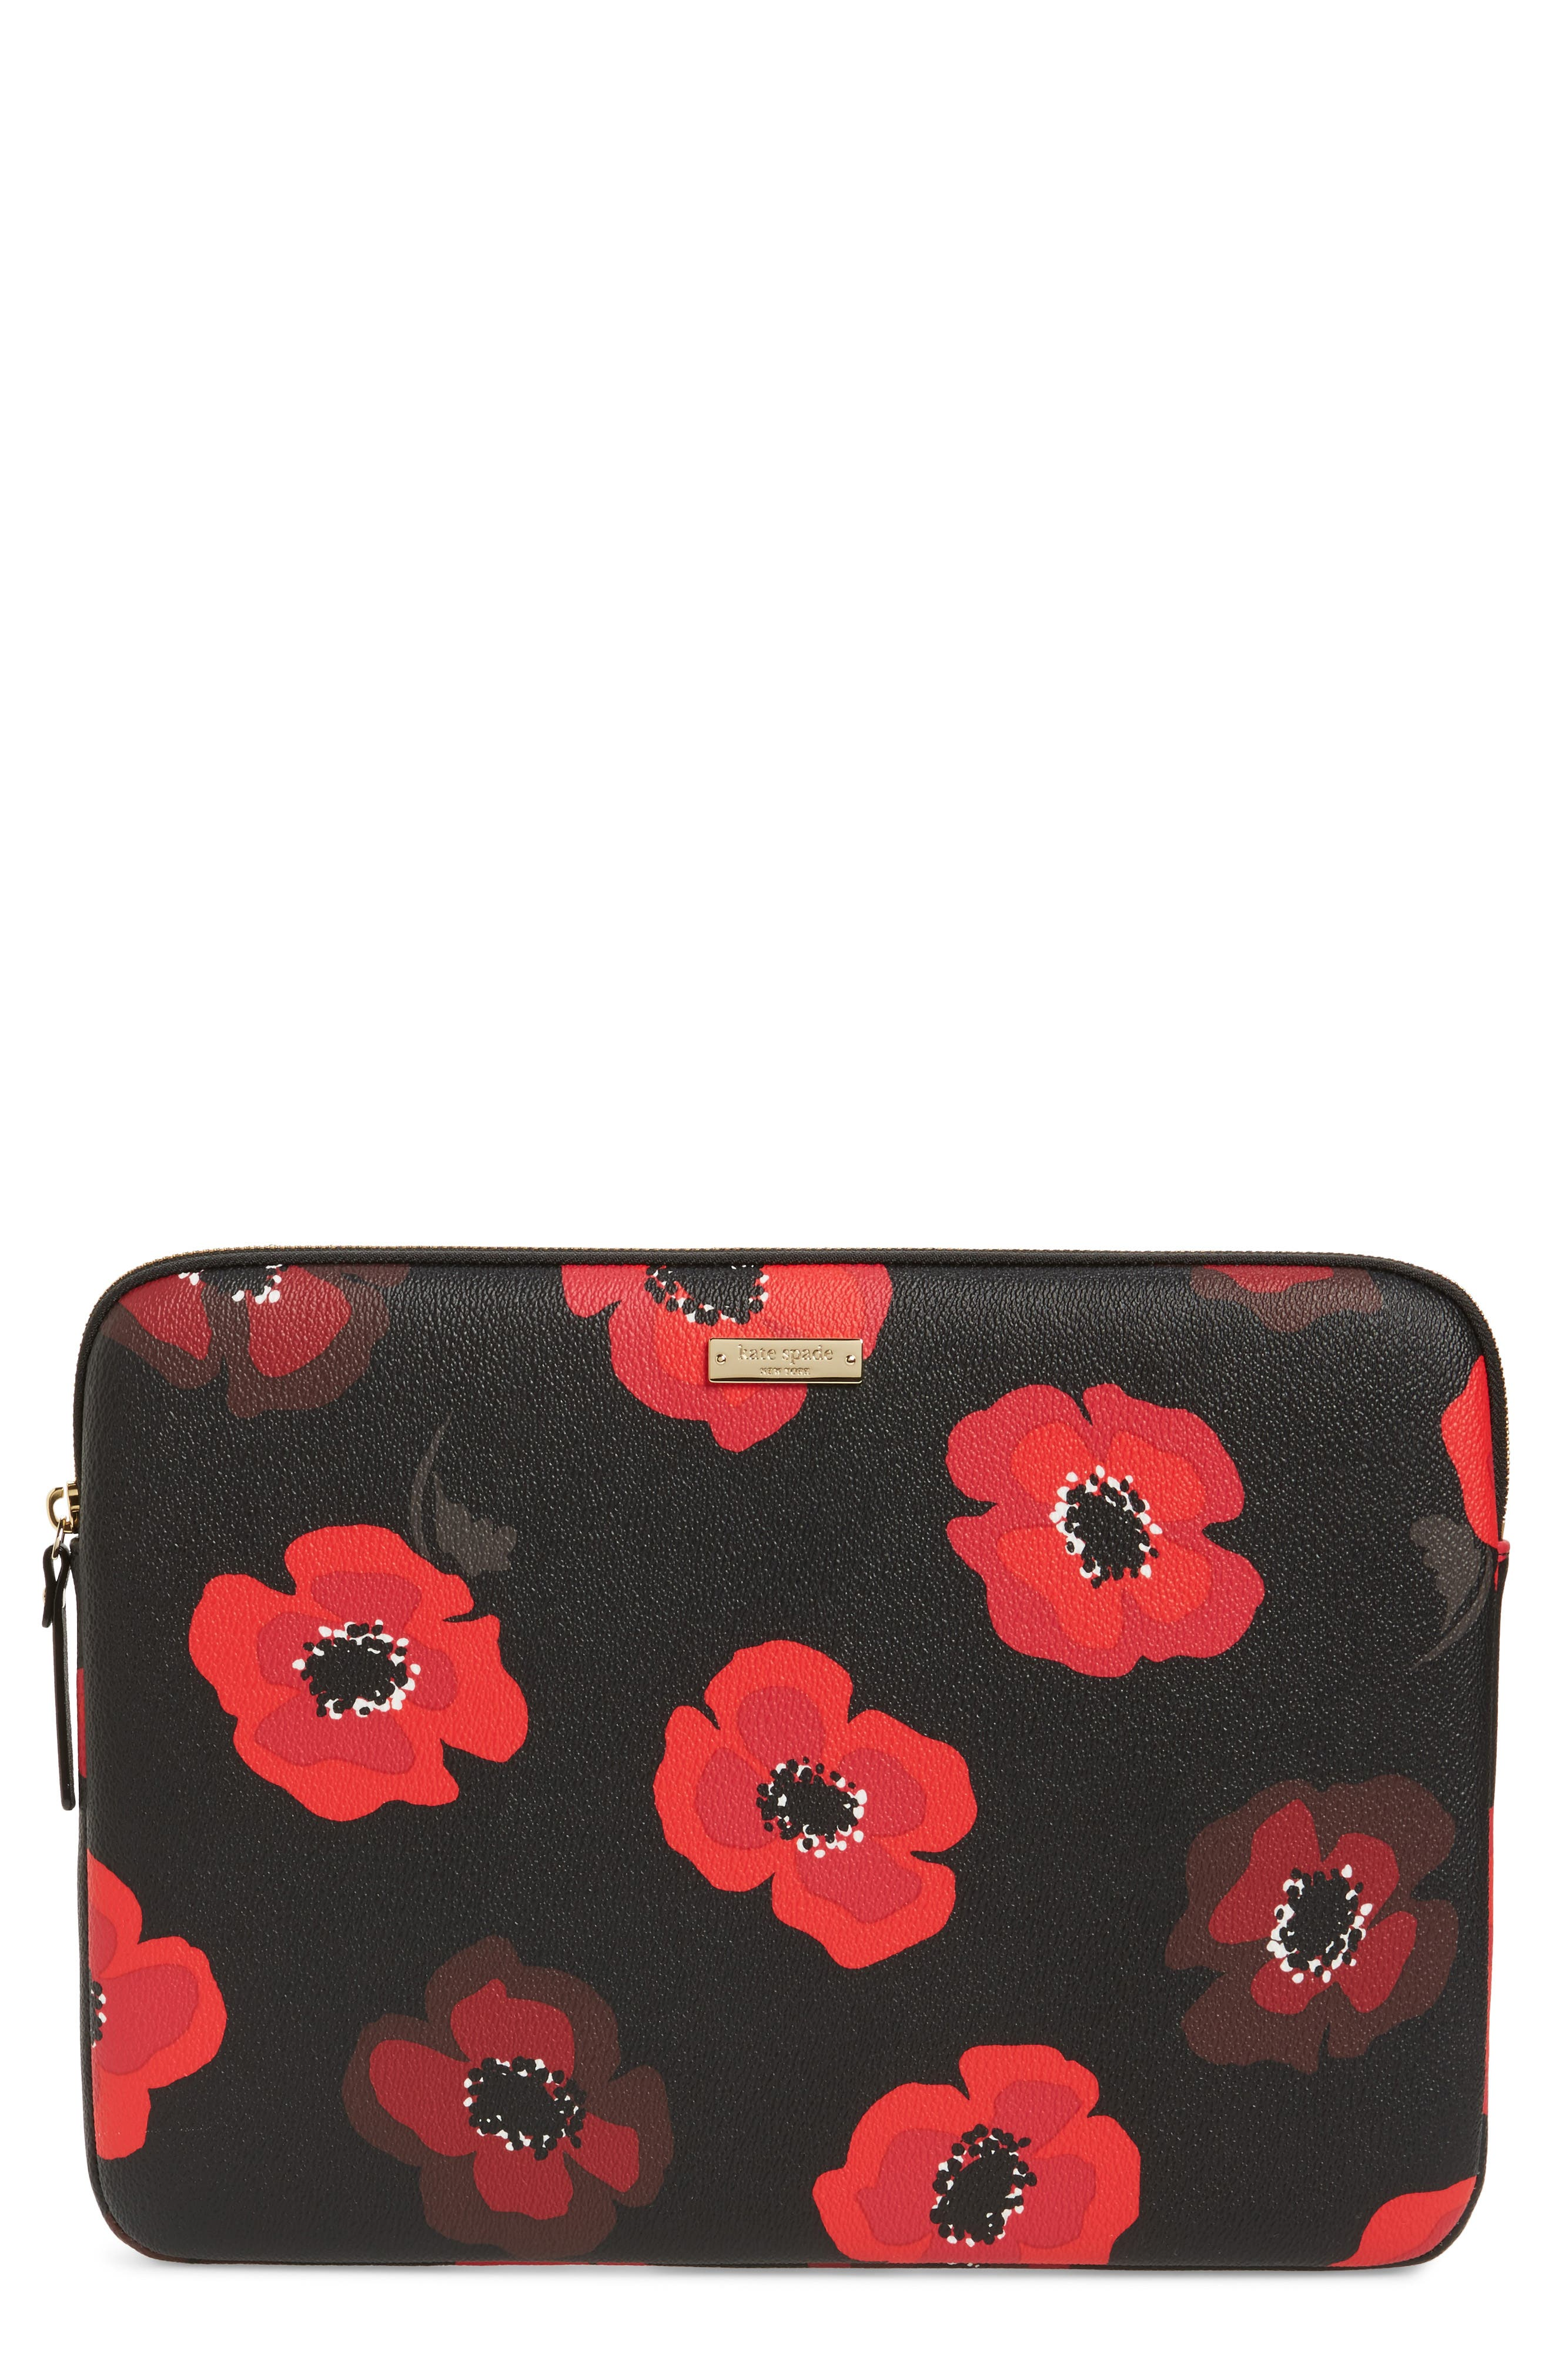 kate spade new york poppy 13-inch laptop sleeve